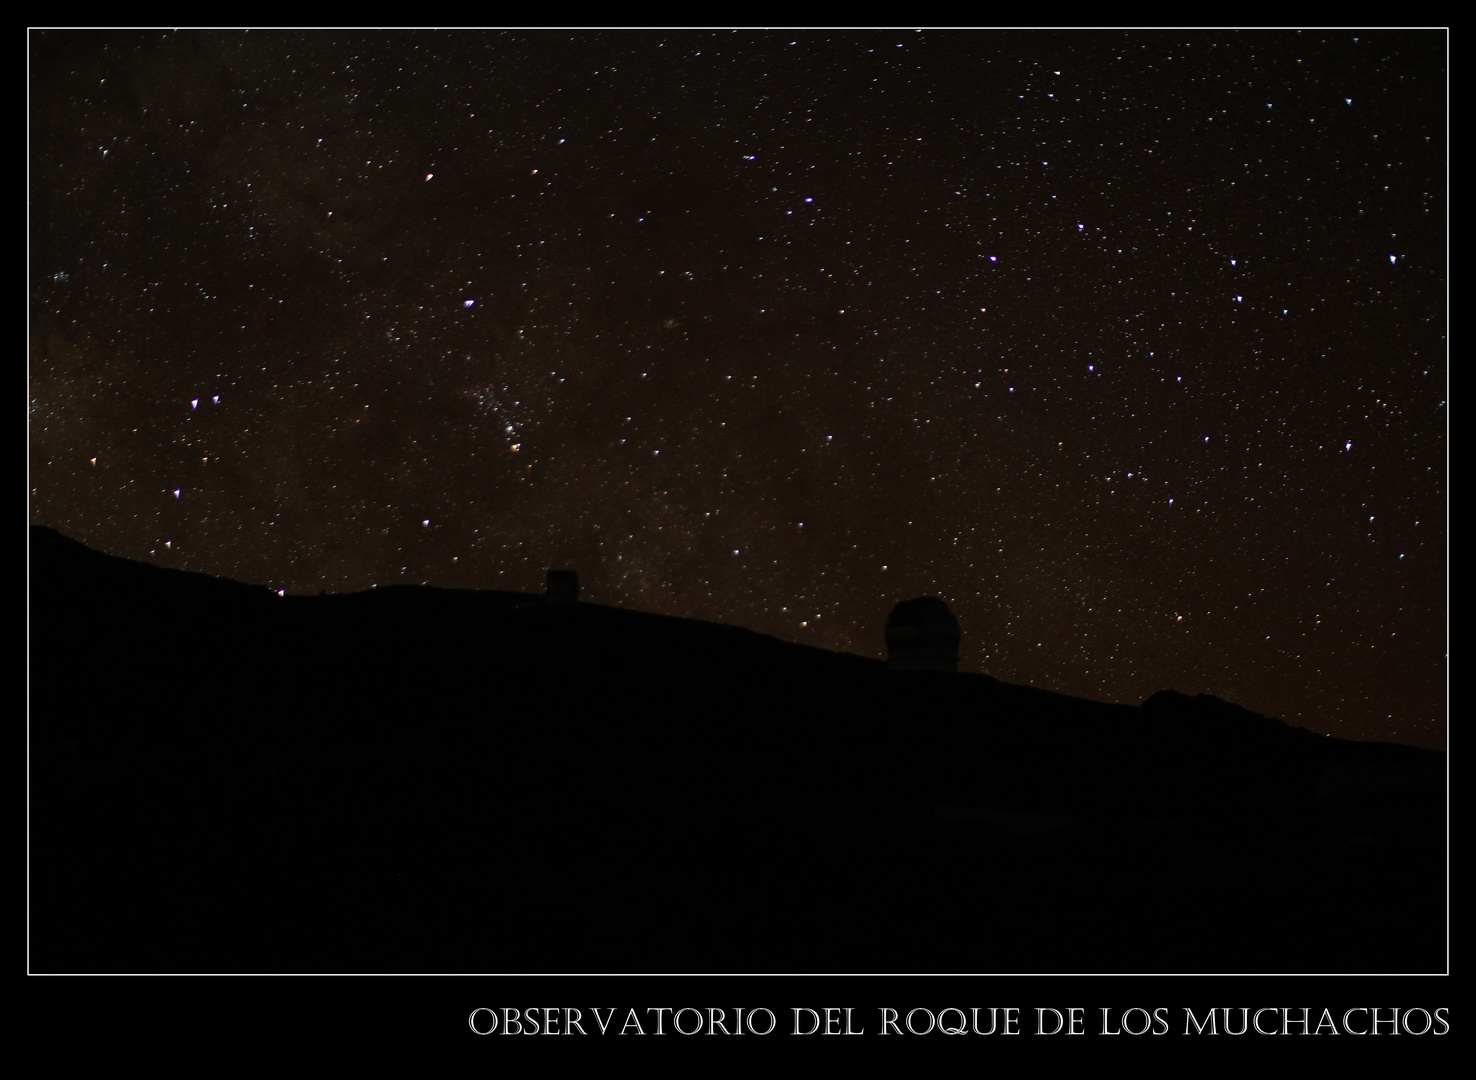 Astrophysisches Observatorium La Palma